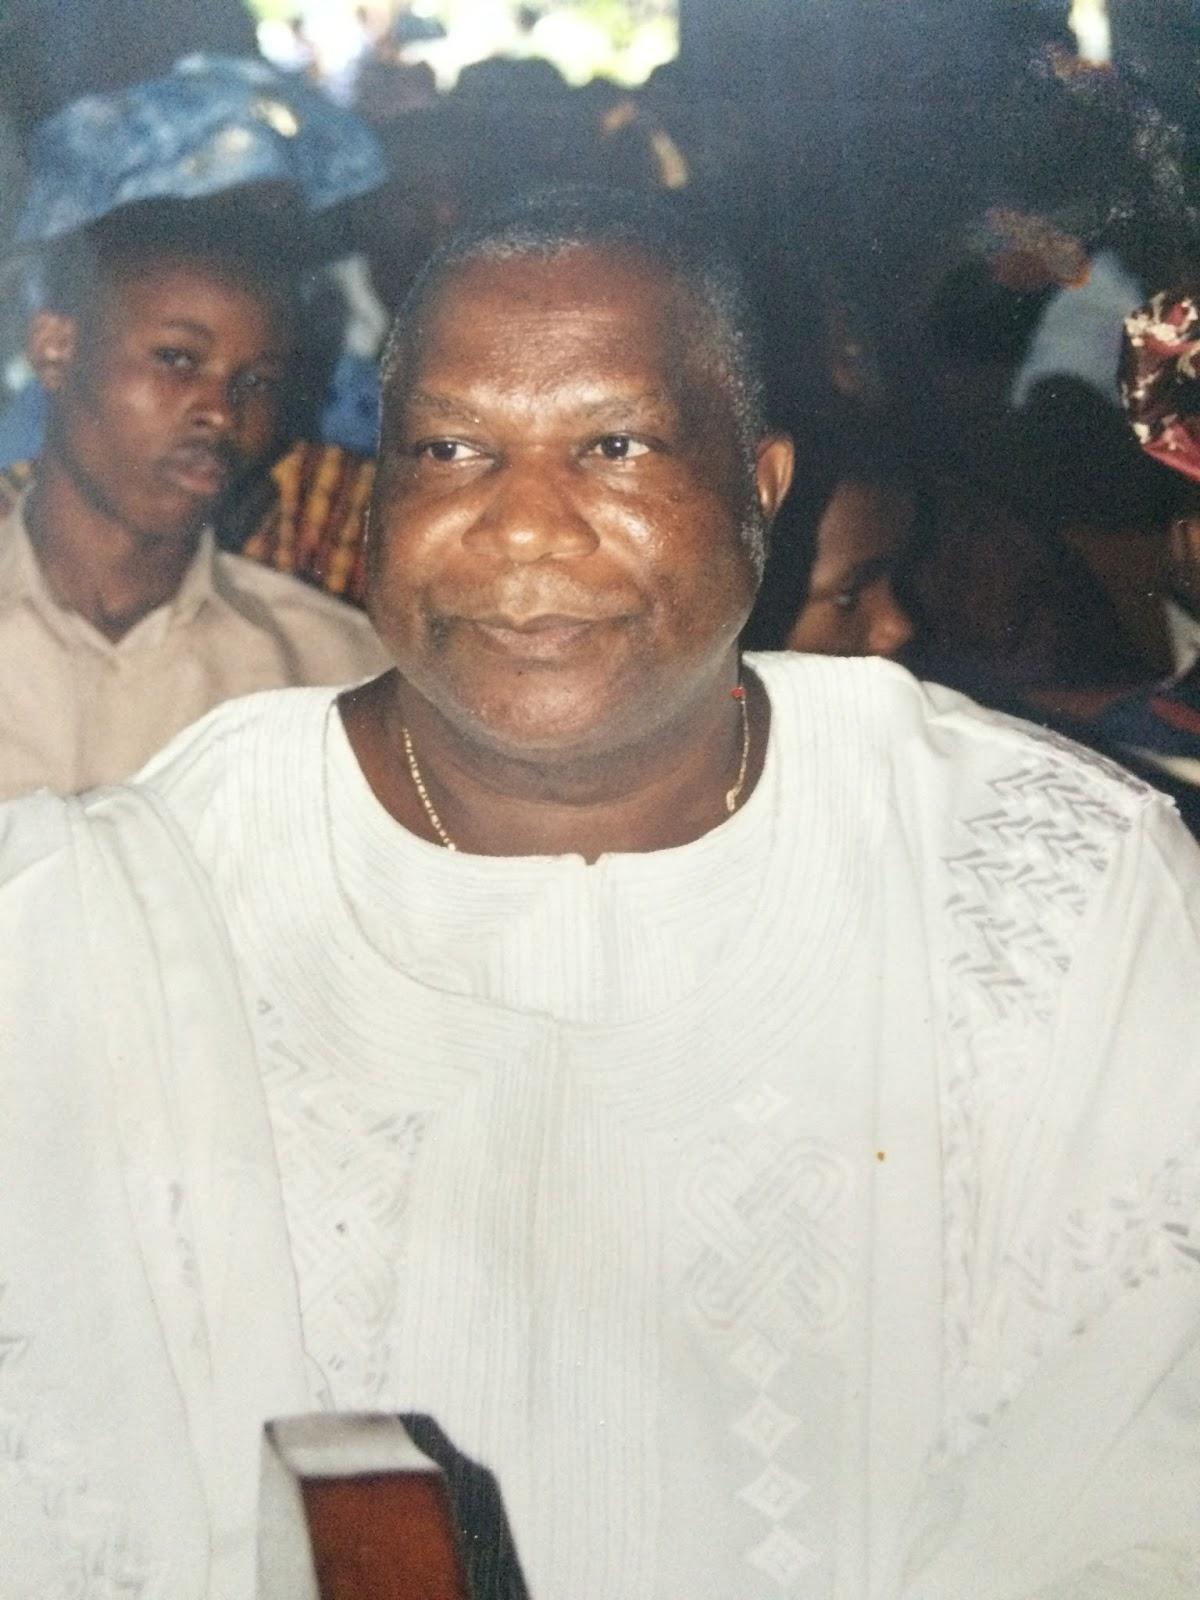 Nigeria: Ife, Modakeke Crisis: the Modakekes Raise the Stakes